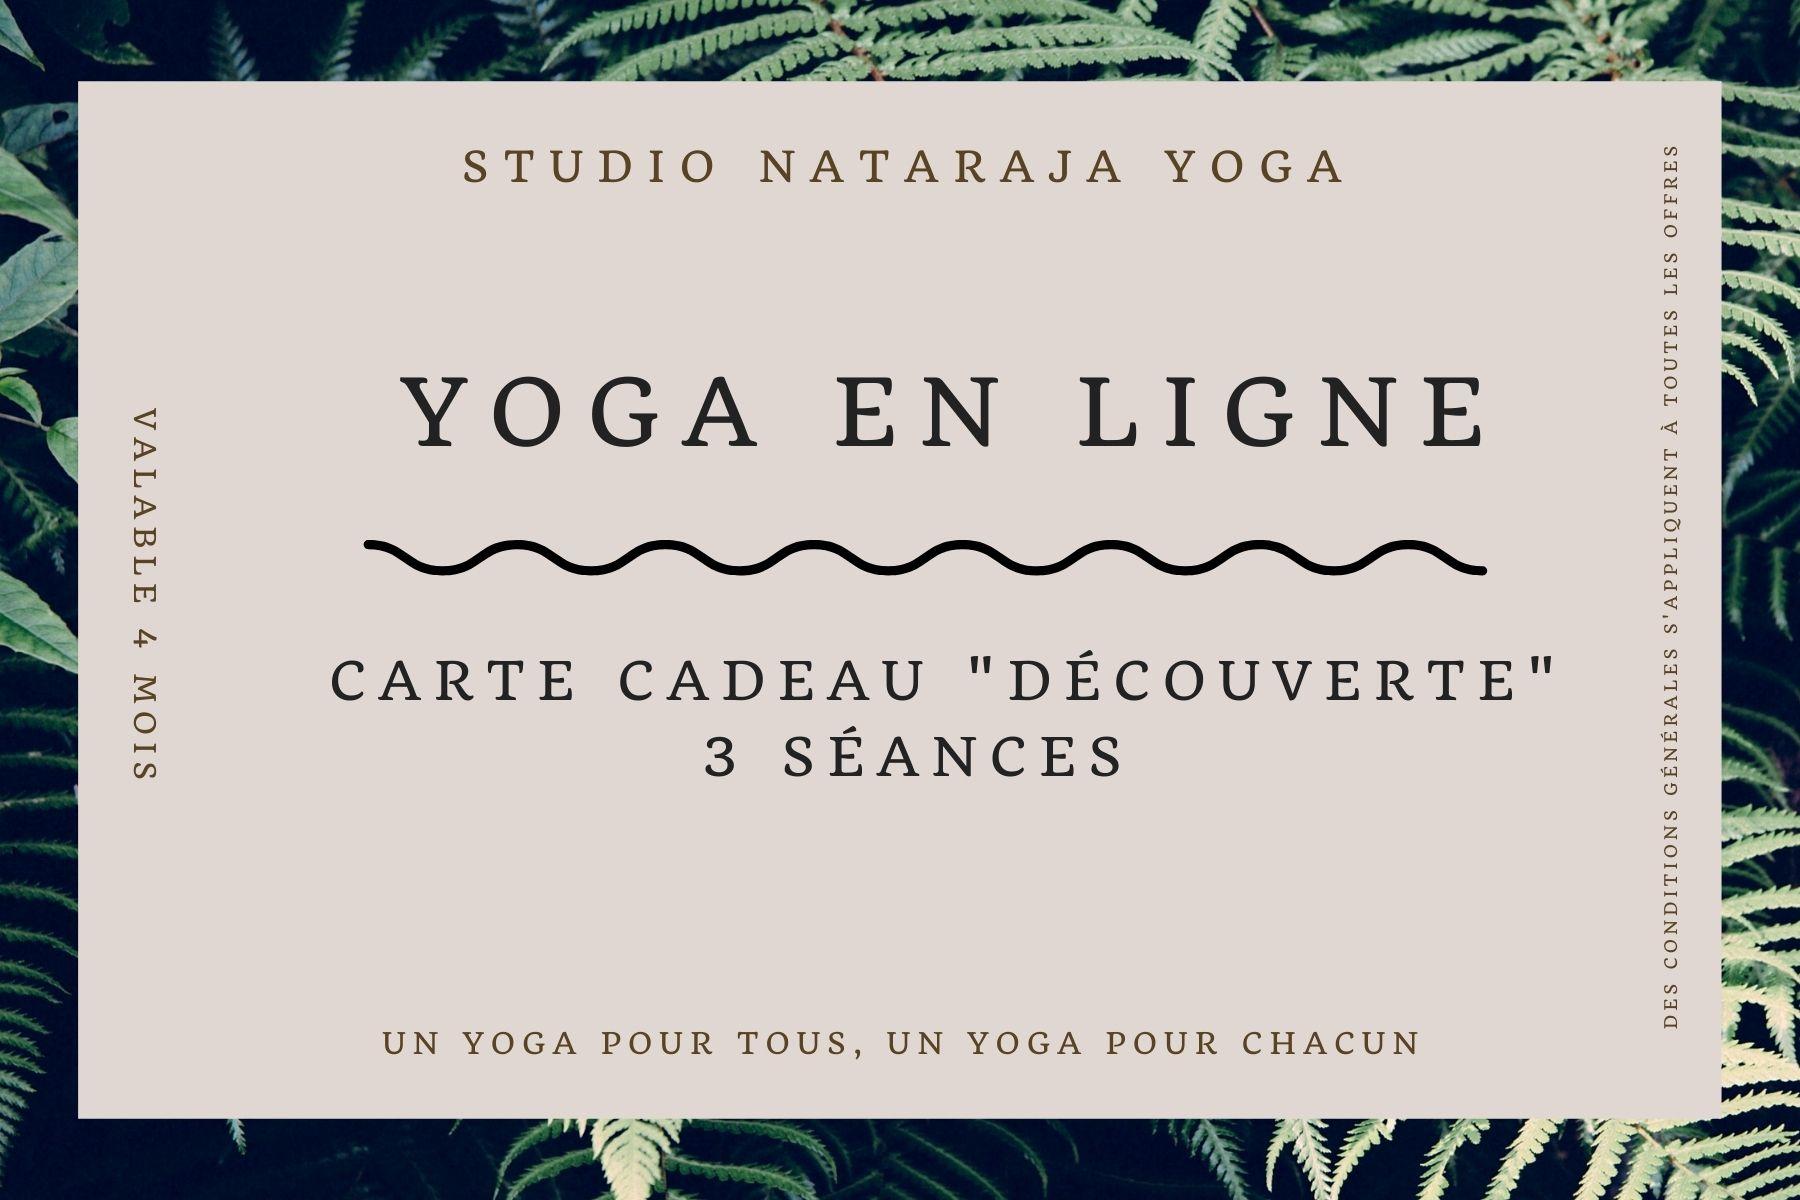 Nos cartes cadeaux Yoga